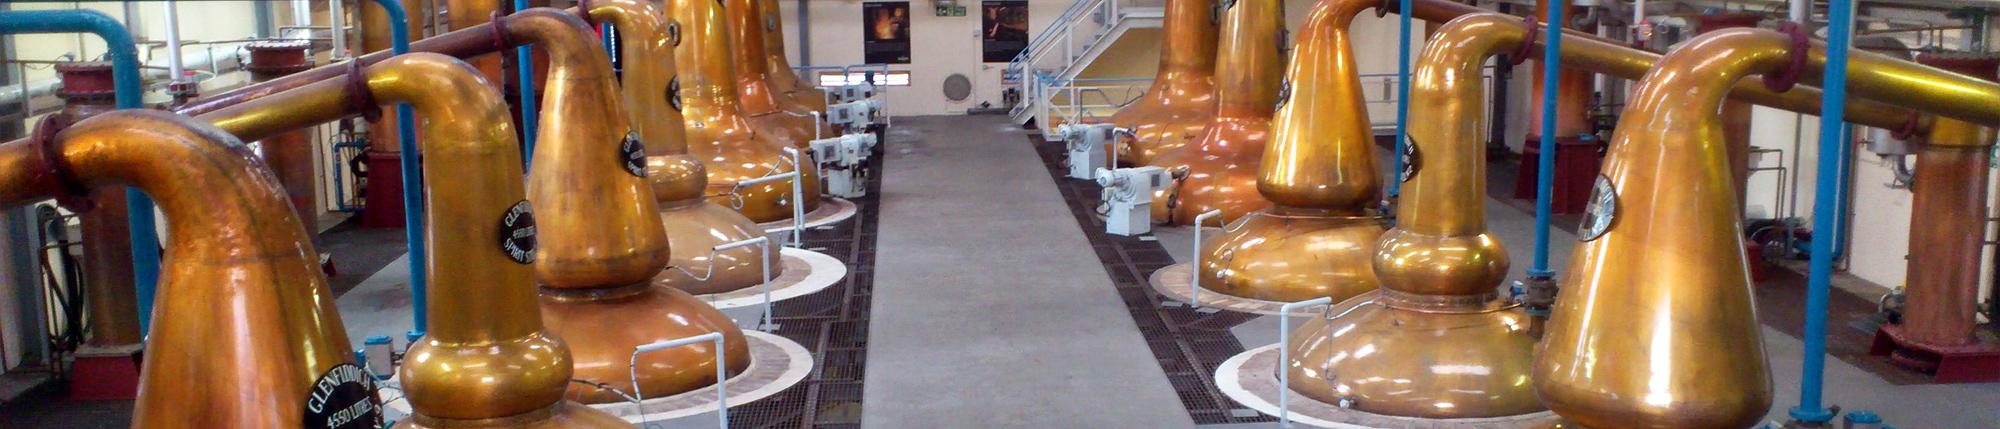 lynebain-whisky-secc2